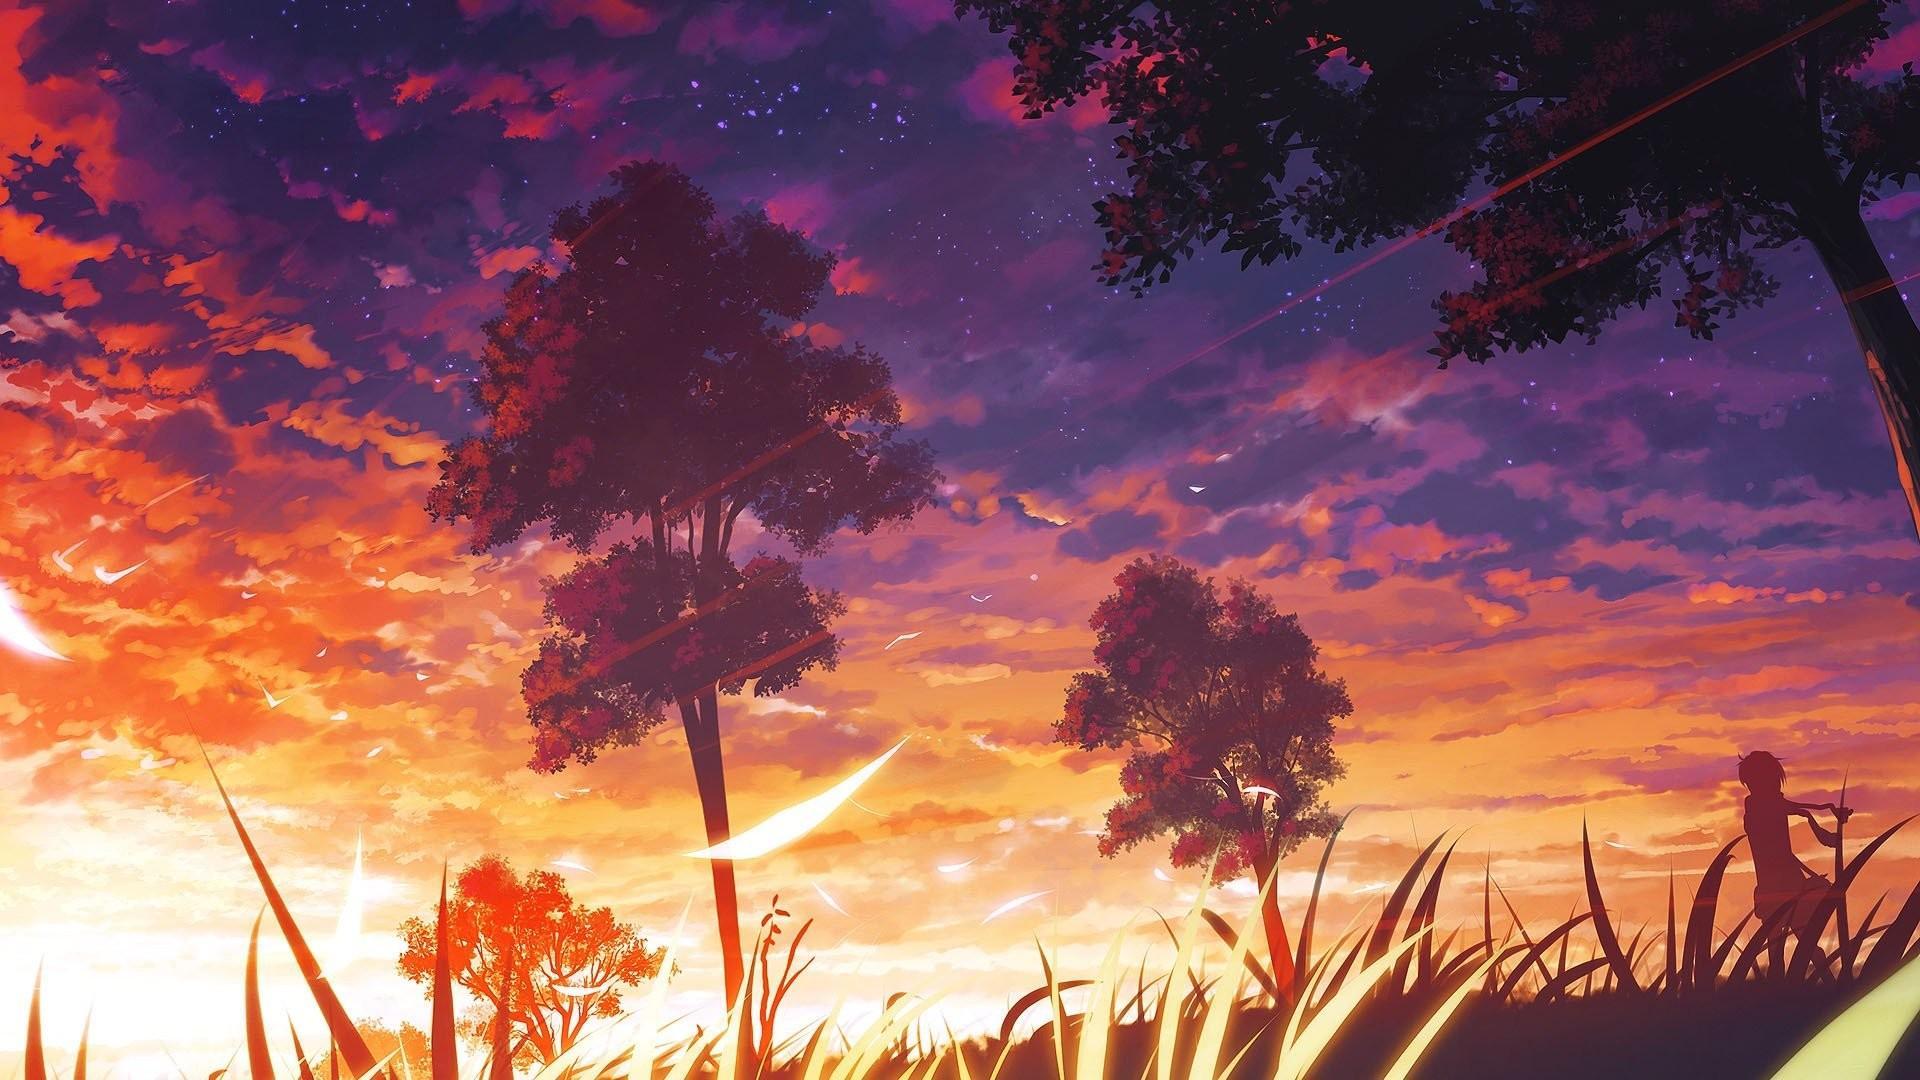 Anime Scenery 4k Wallpapers - Wallpaper ...